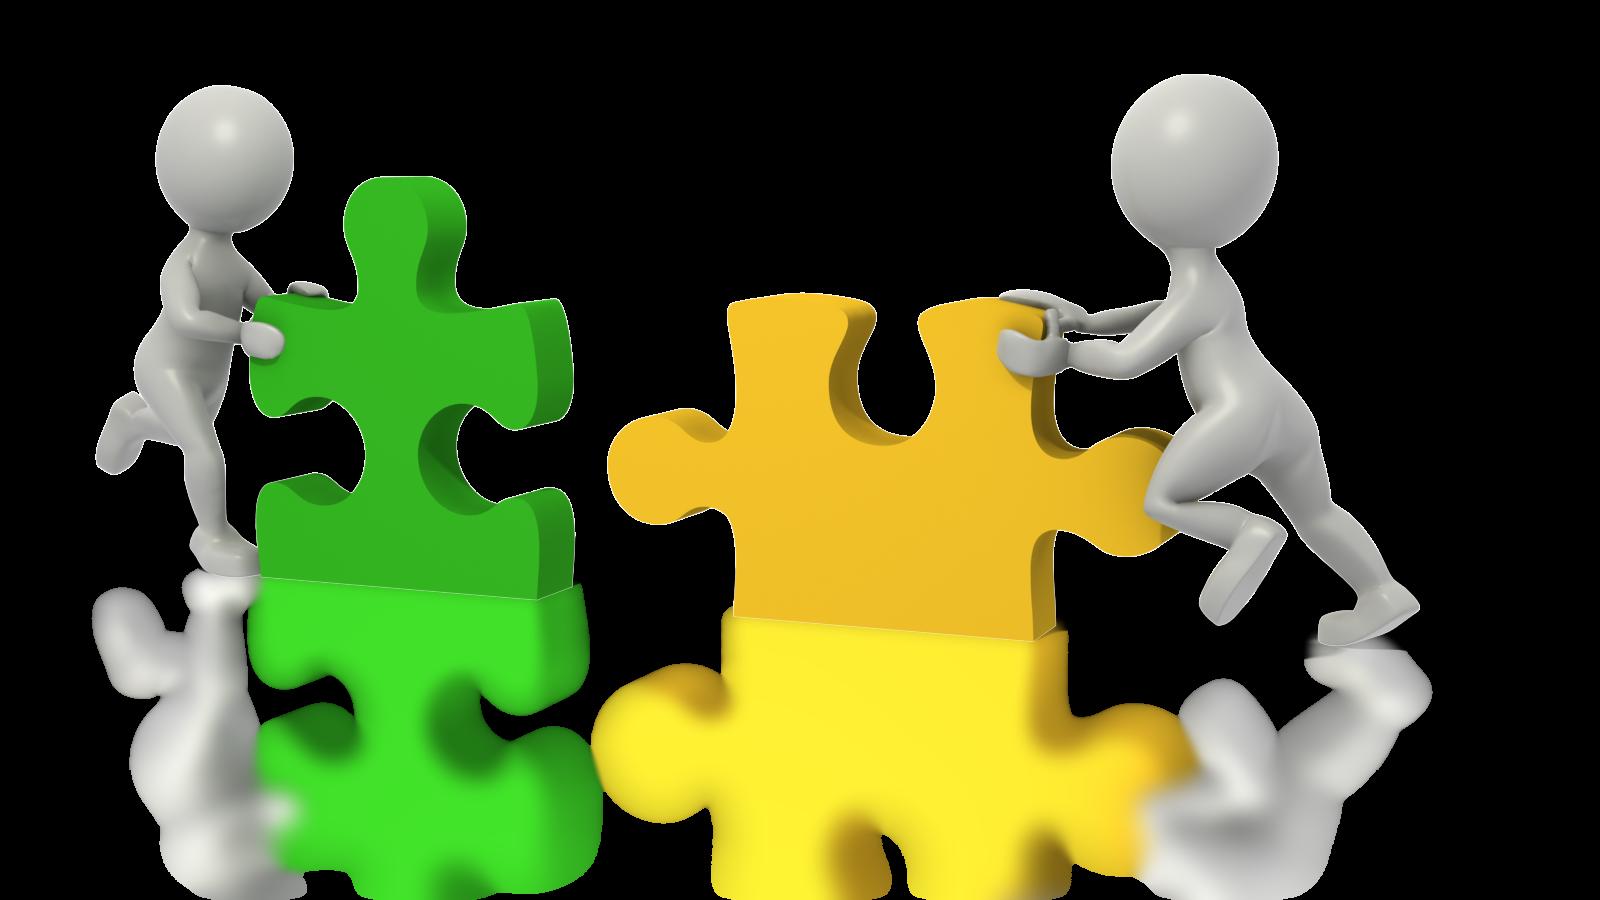 Vision clipart organization. People puzzle pieces luke